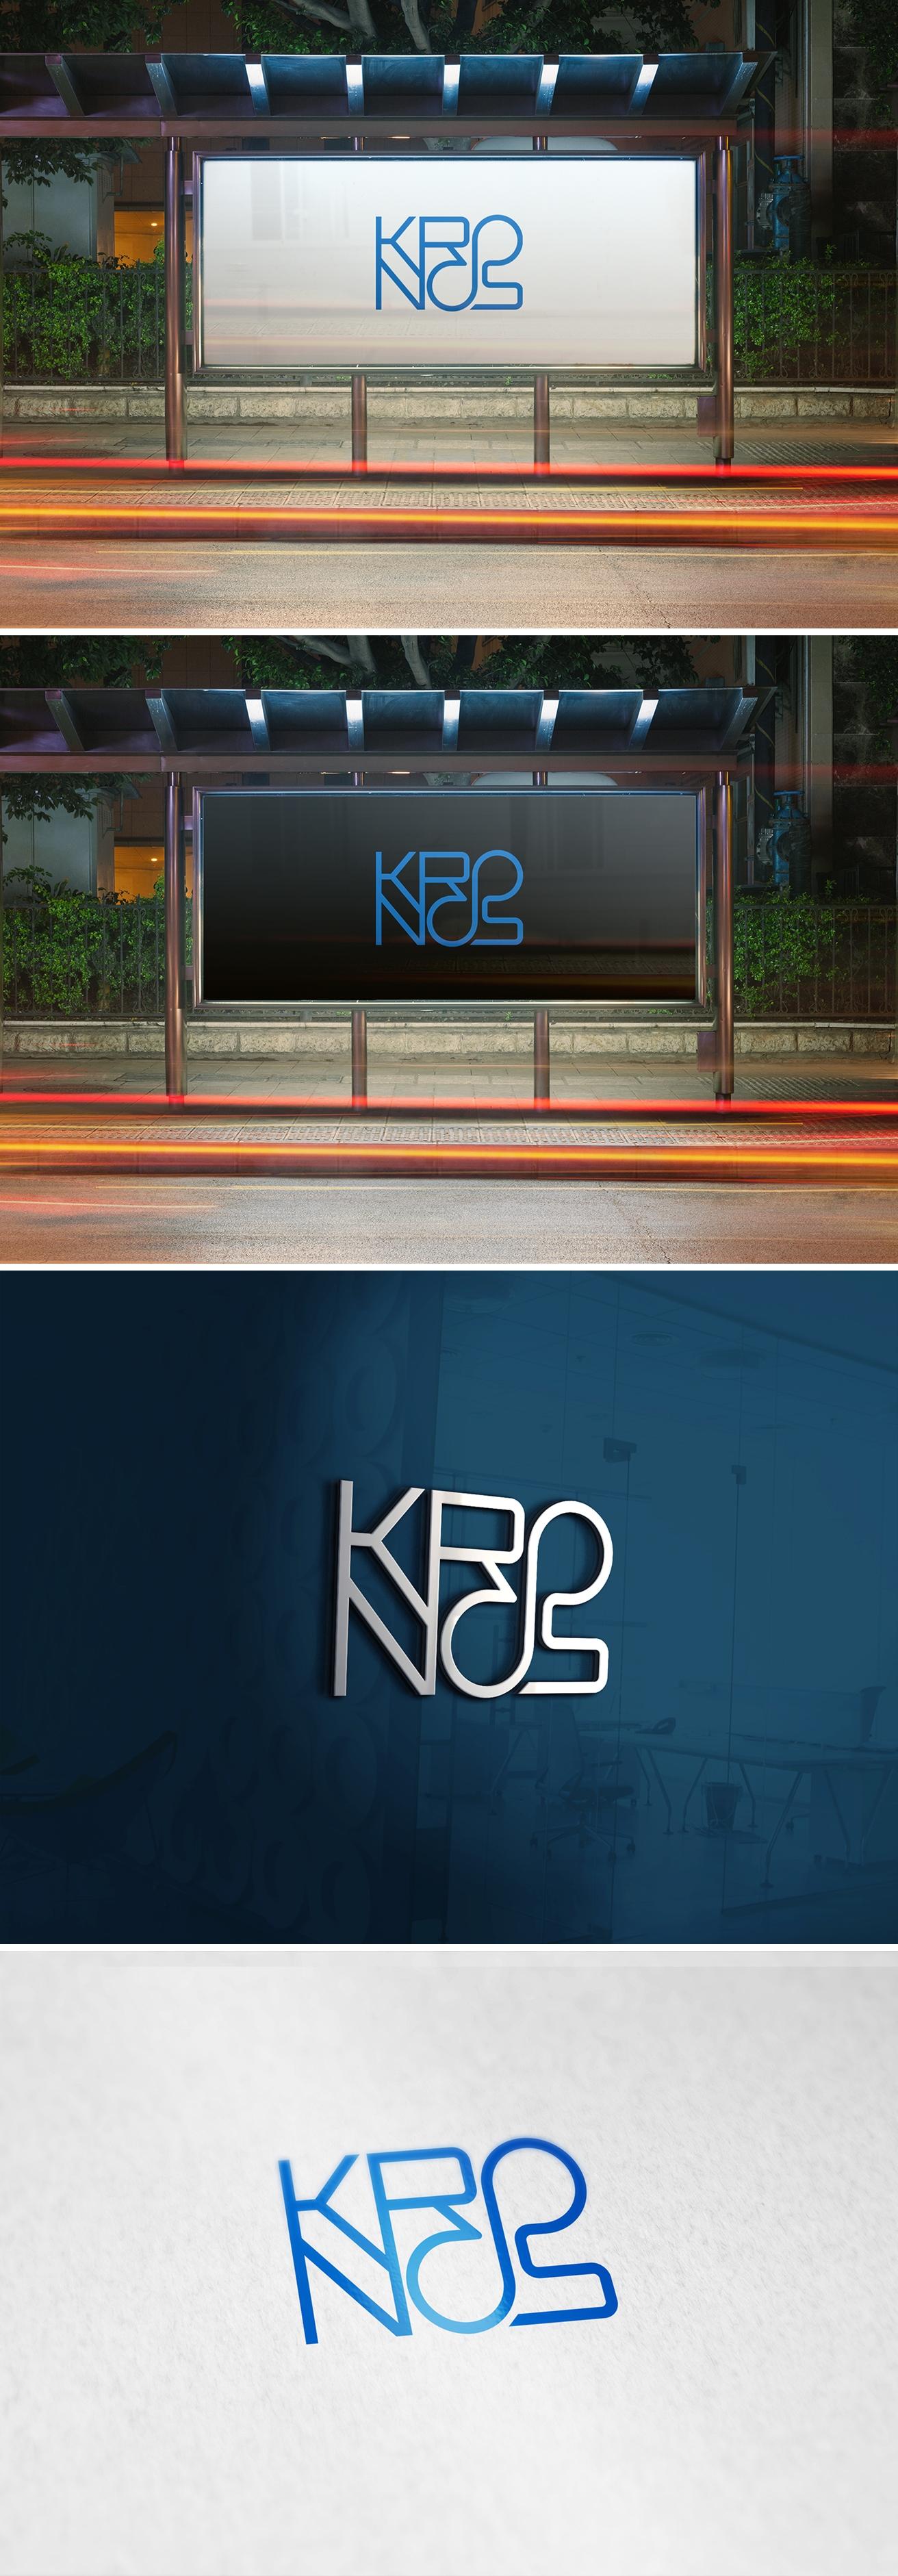 Разработать логотип KRONOS фото f_9025fafd5a957063.jpg